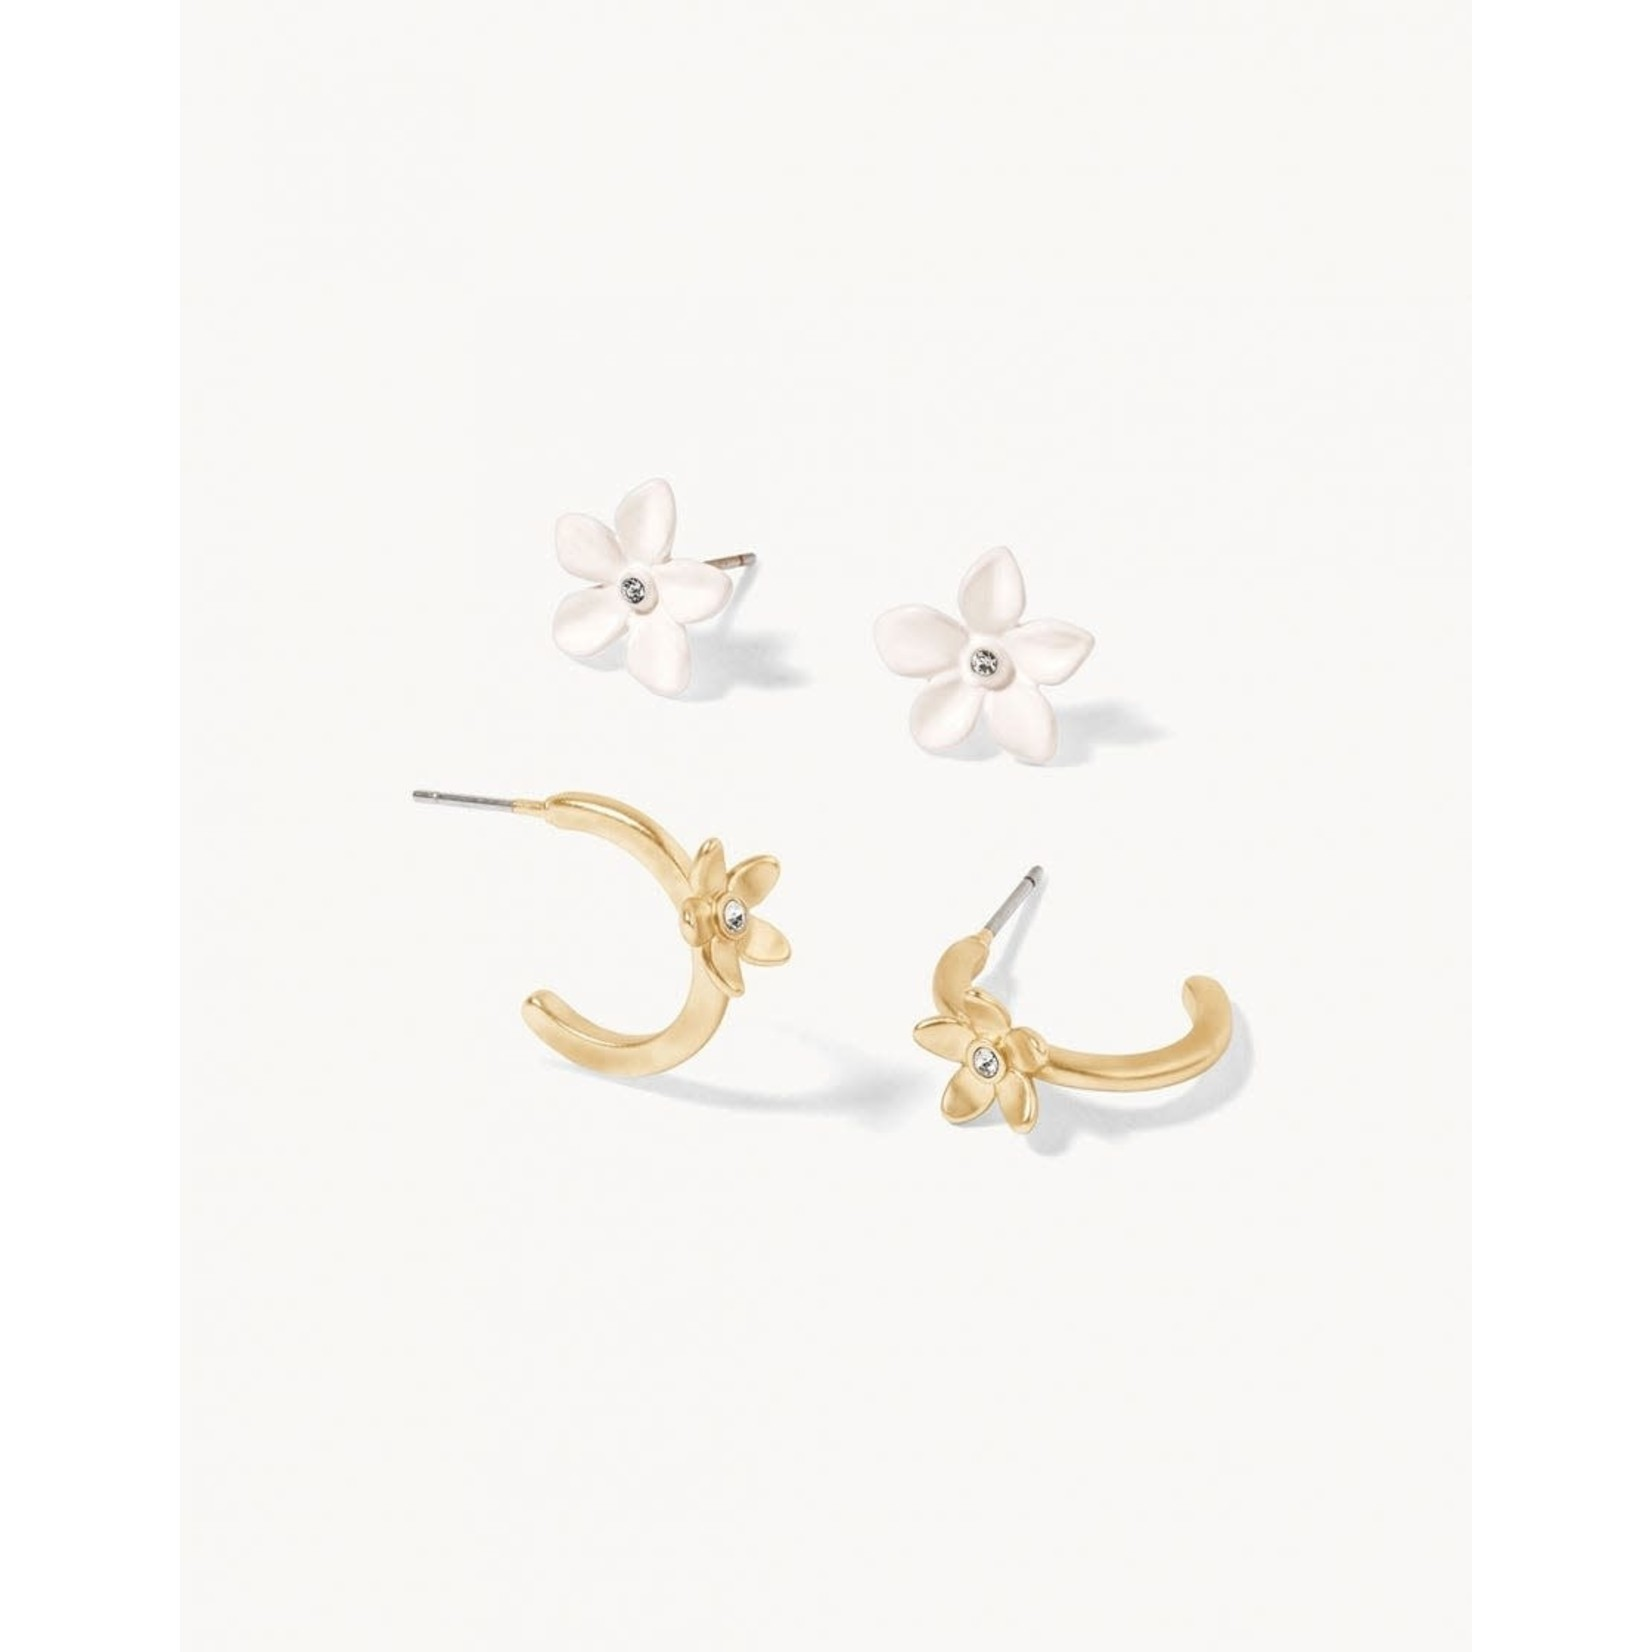 Spartina Garden Party Stud Earrings Set White - 2 pr